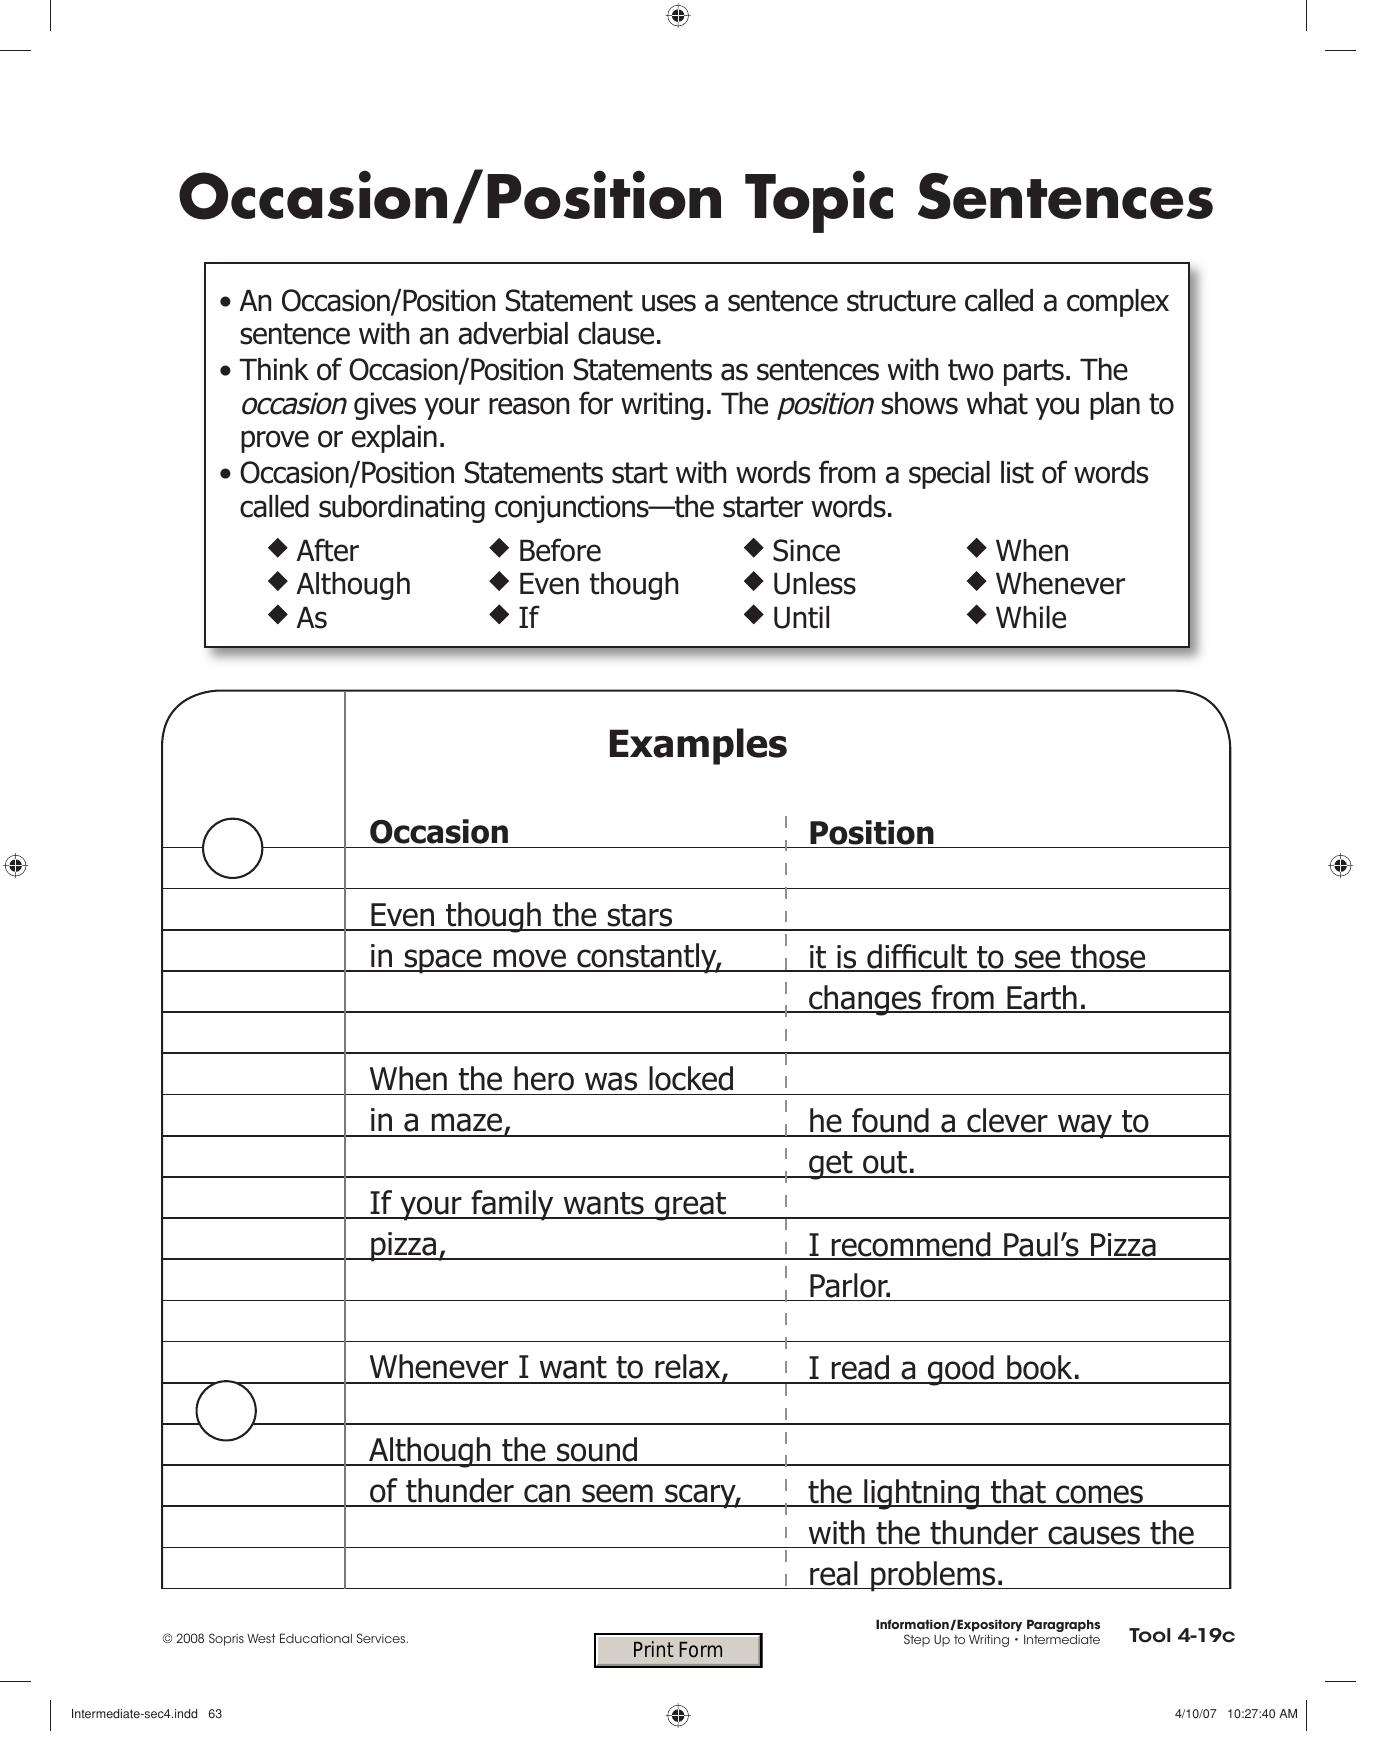 Occasion/Position Topic Sentences